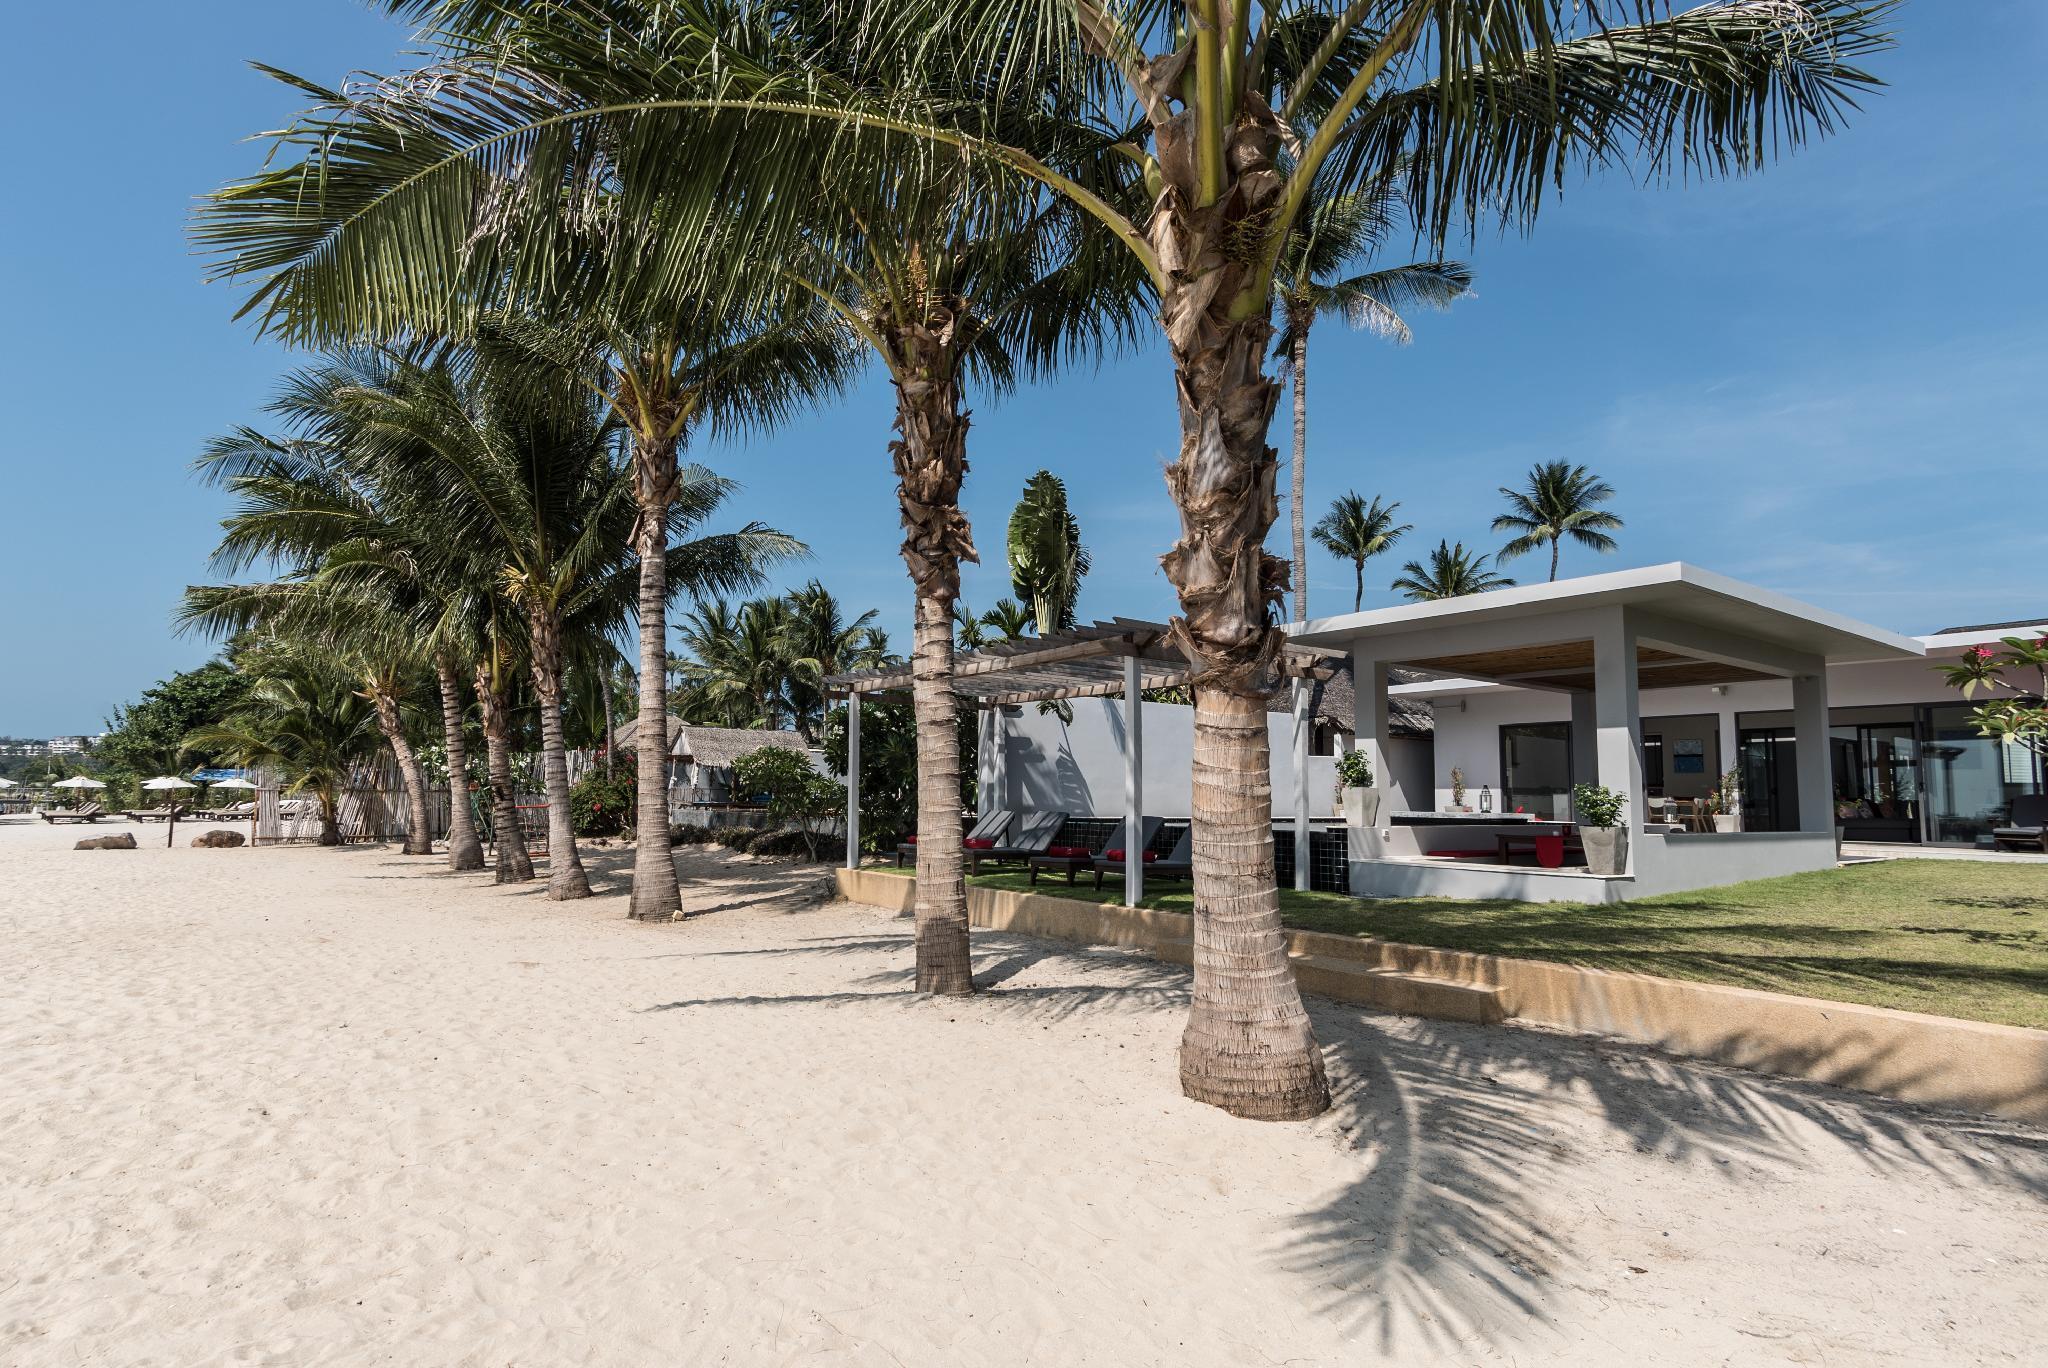 Villa Red - a stunning 4 bedroom beach villa วิลลา 4 ห้องนอน 5 ห้องน้ำส่วนตัว ขนาด 200 ตร.ม. – เชิงมน